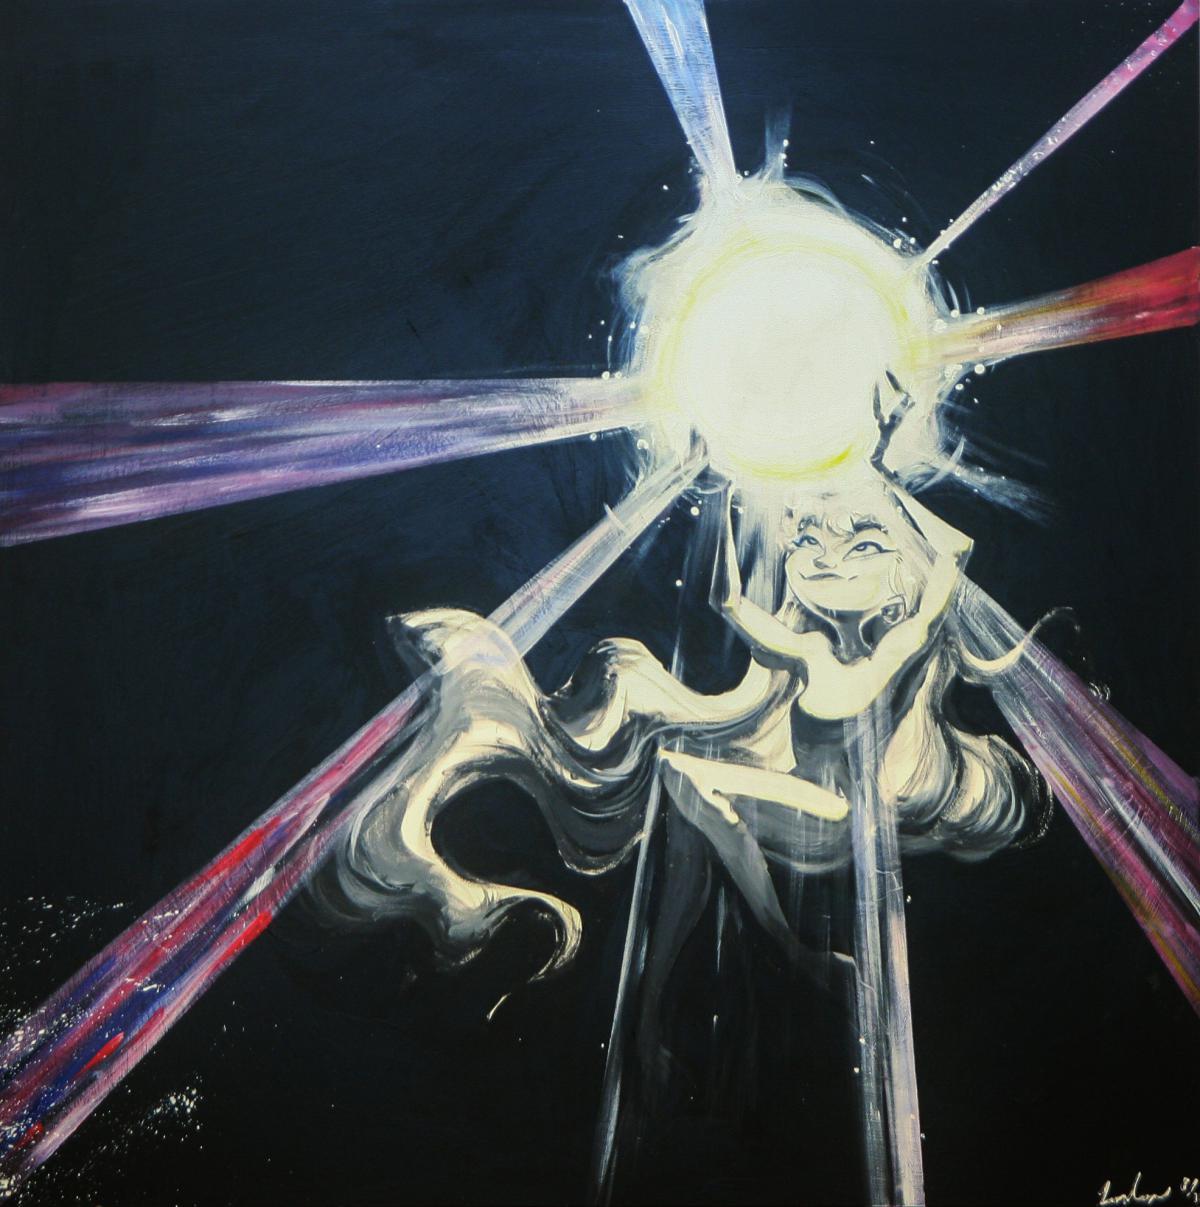 Marvel inspired Artwork by Lorenzo Crump (Ryman '16)